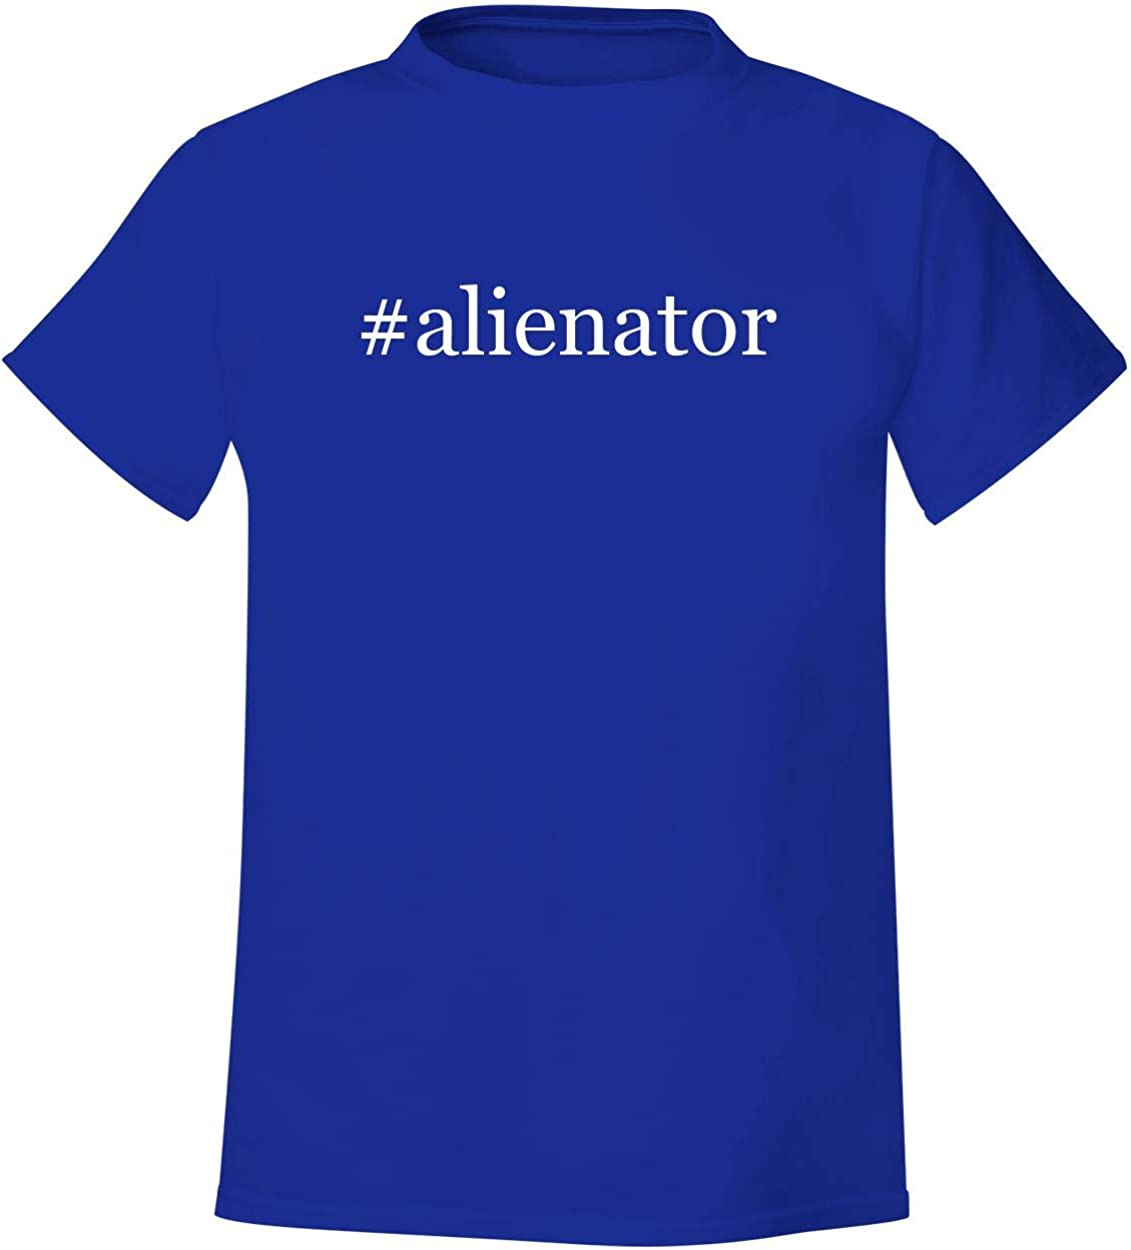 #Alienator - Men'S Hashtag weich & Comfortable T-Shirt